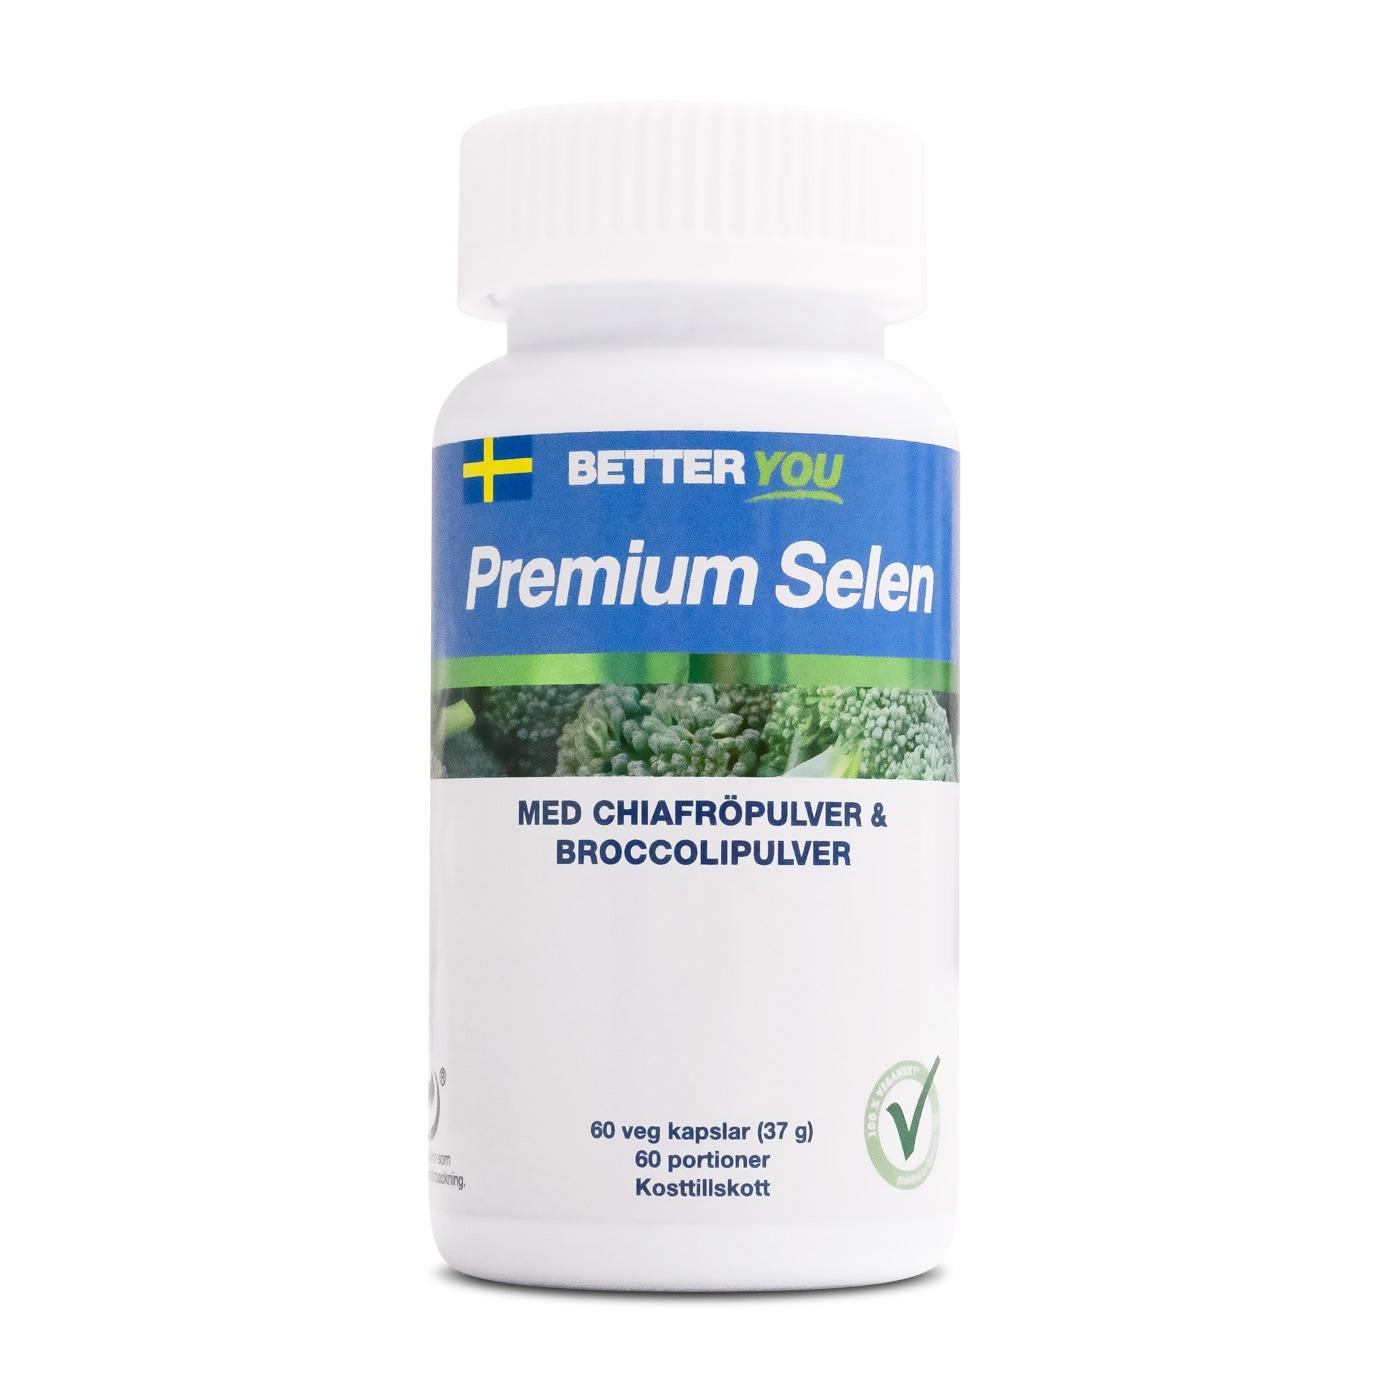 Premium Selen